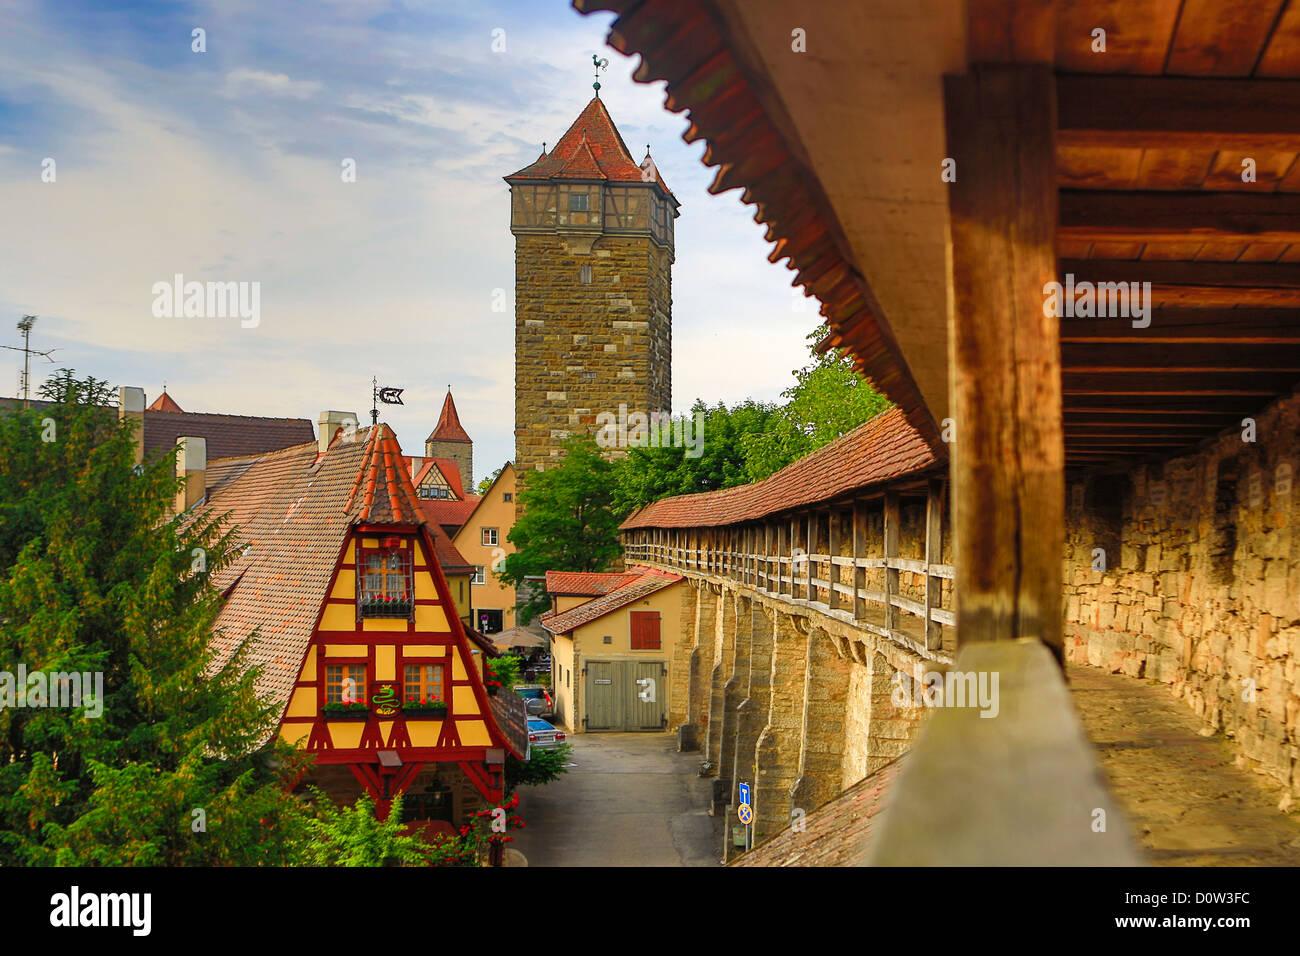 Germany, Europe, travel, Rothenburg, Romantic Road, Alte Schmiede, architecture, Bavaria, house, road, romantic, - Stock Image